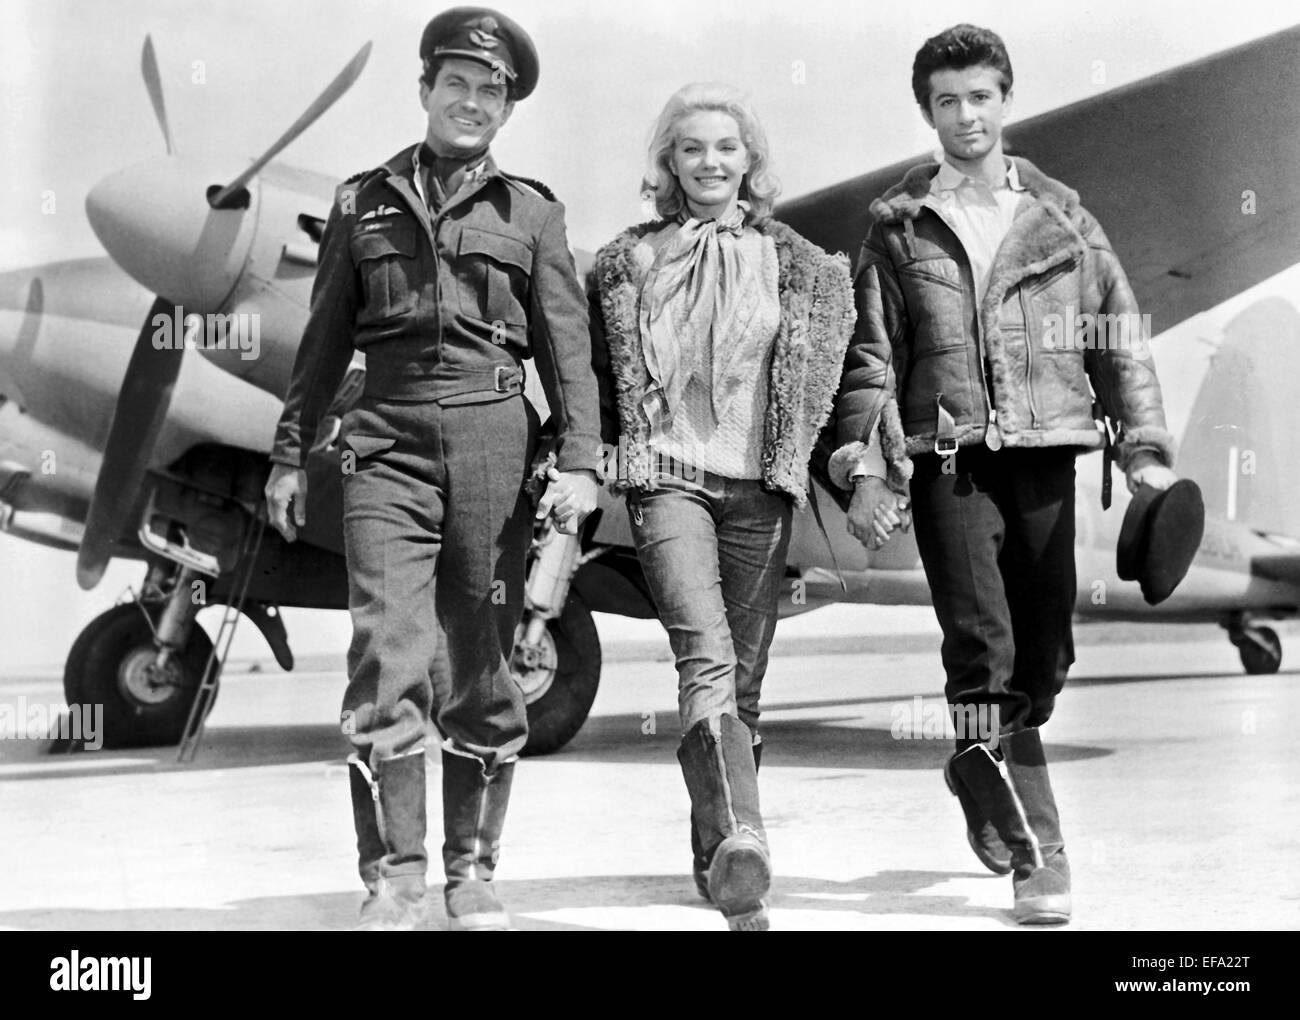 CLIFF ROBERTSON MARIA PERSCHY & GEORGE CHAKIRIS 633 SQUADRON (1964)